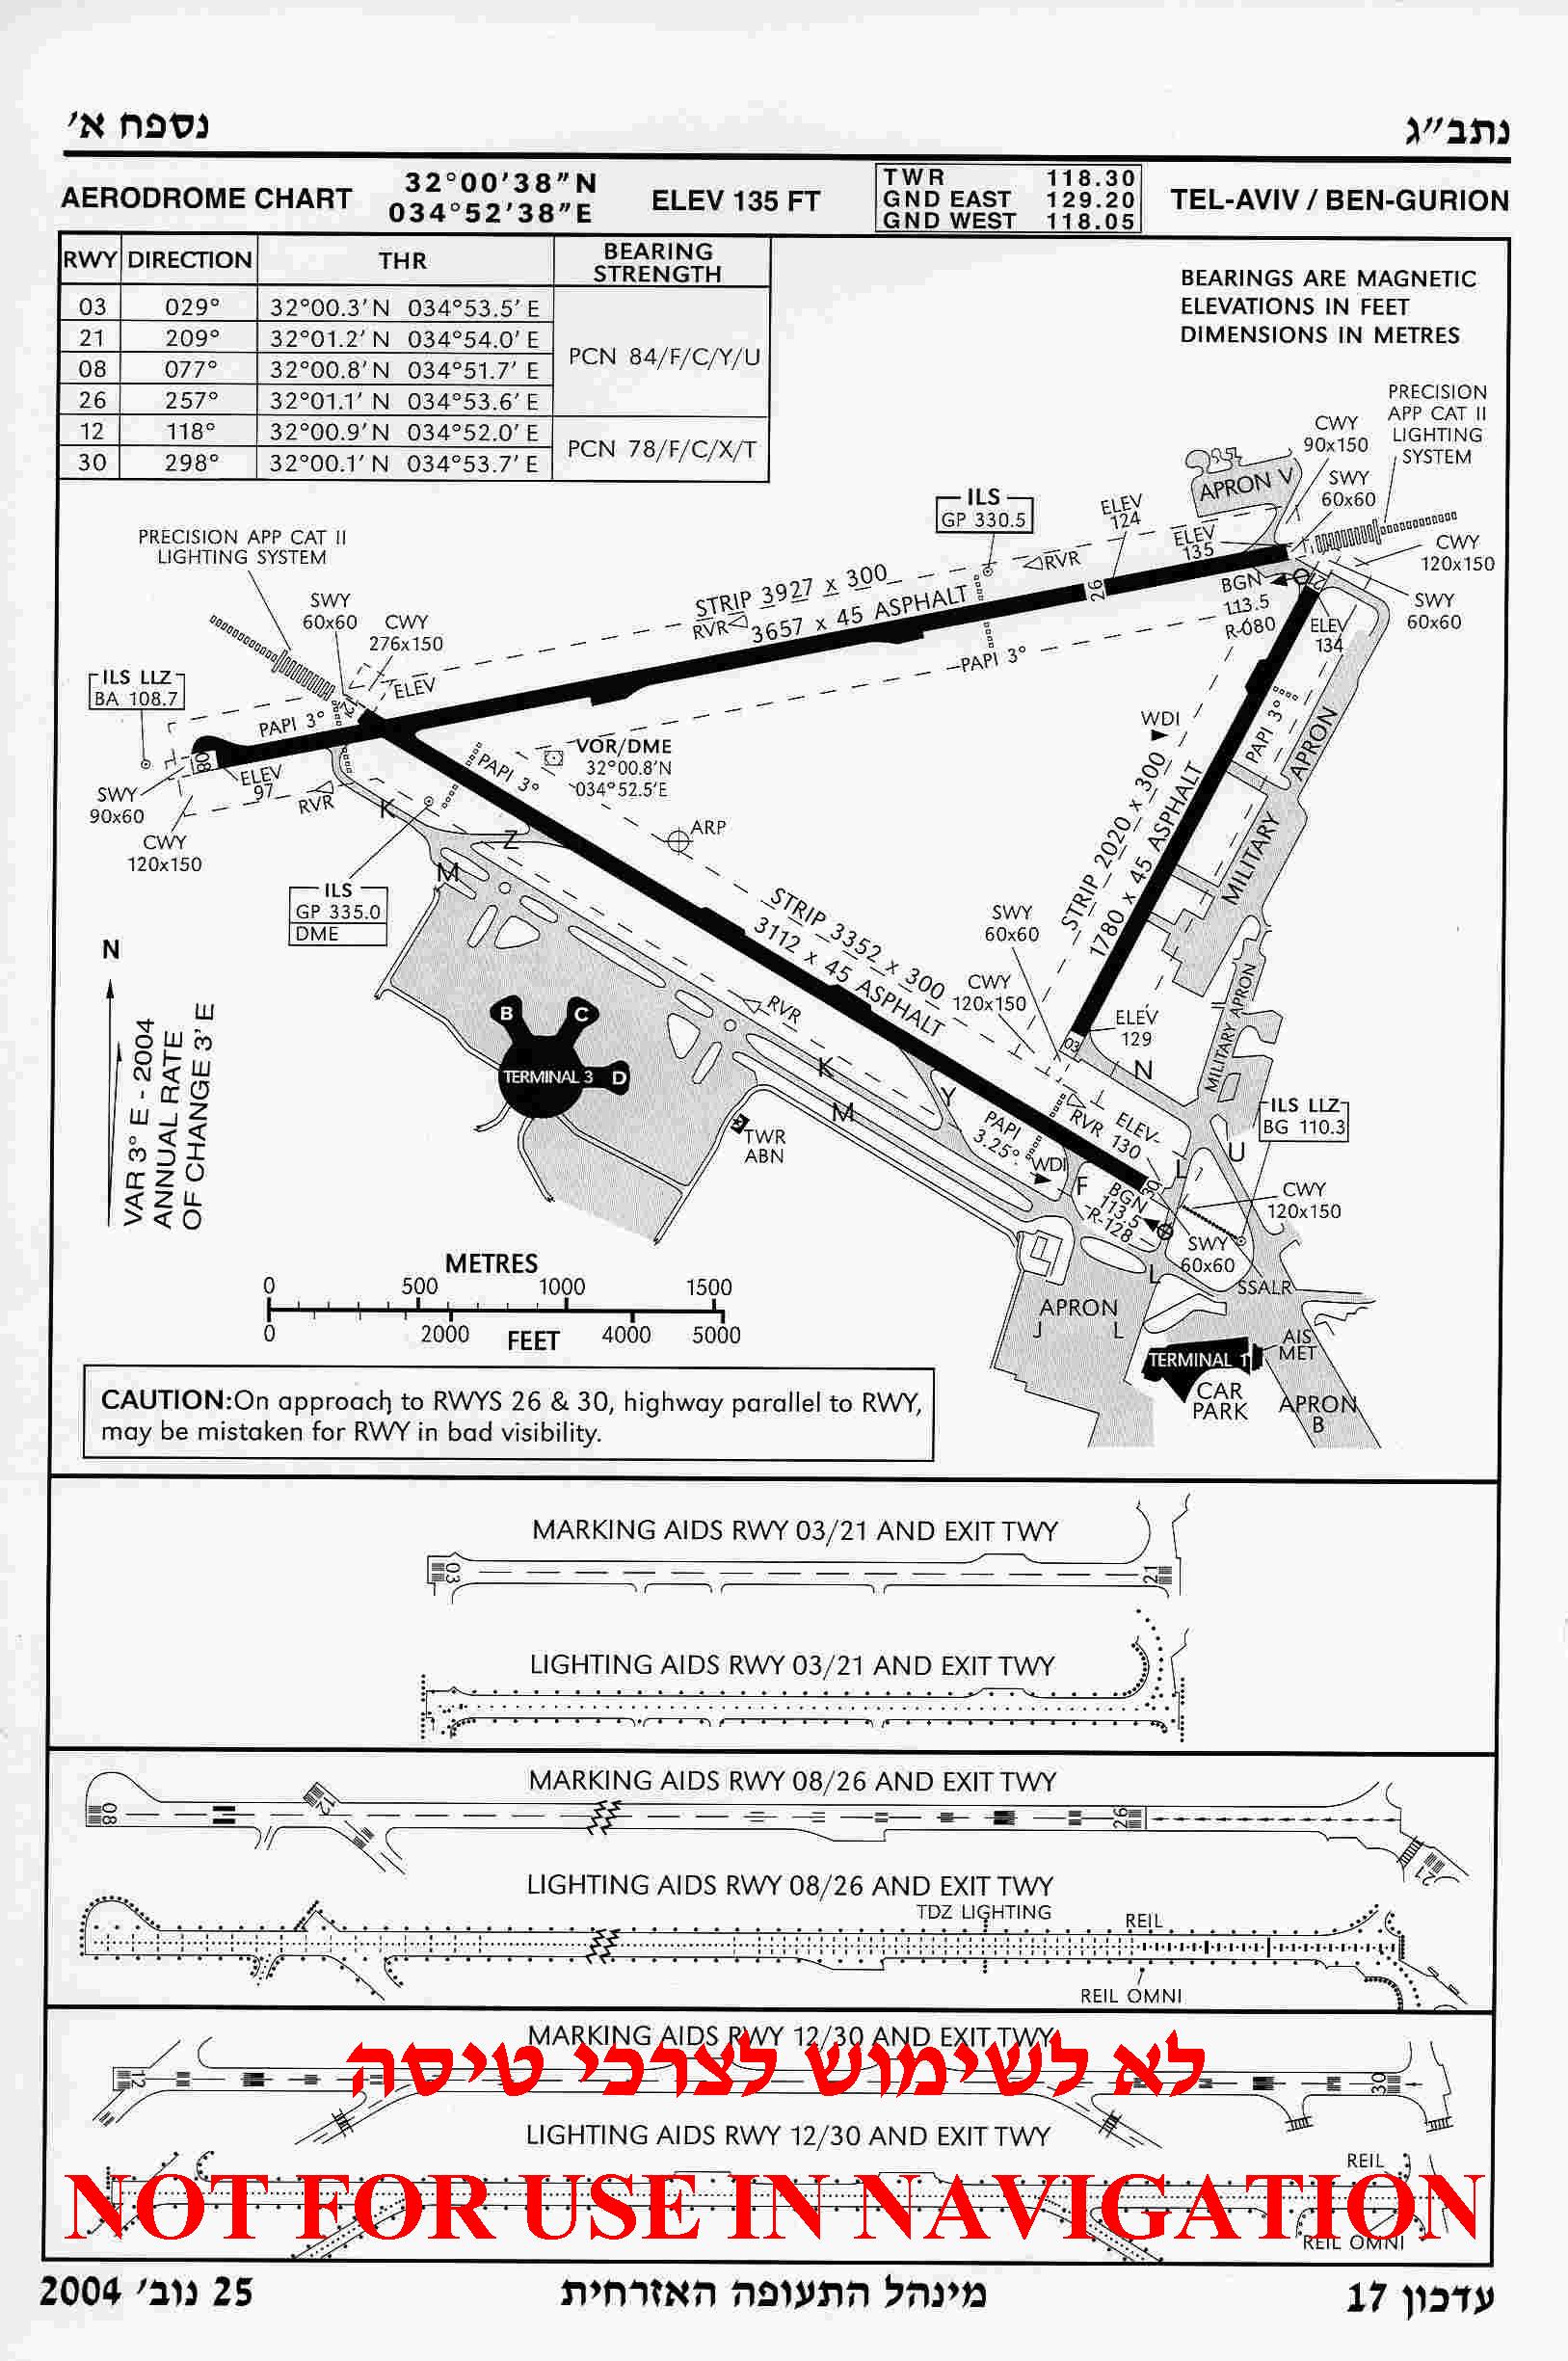 Аэропорт бен гурион схема фото 27